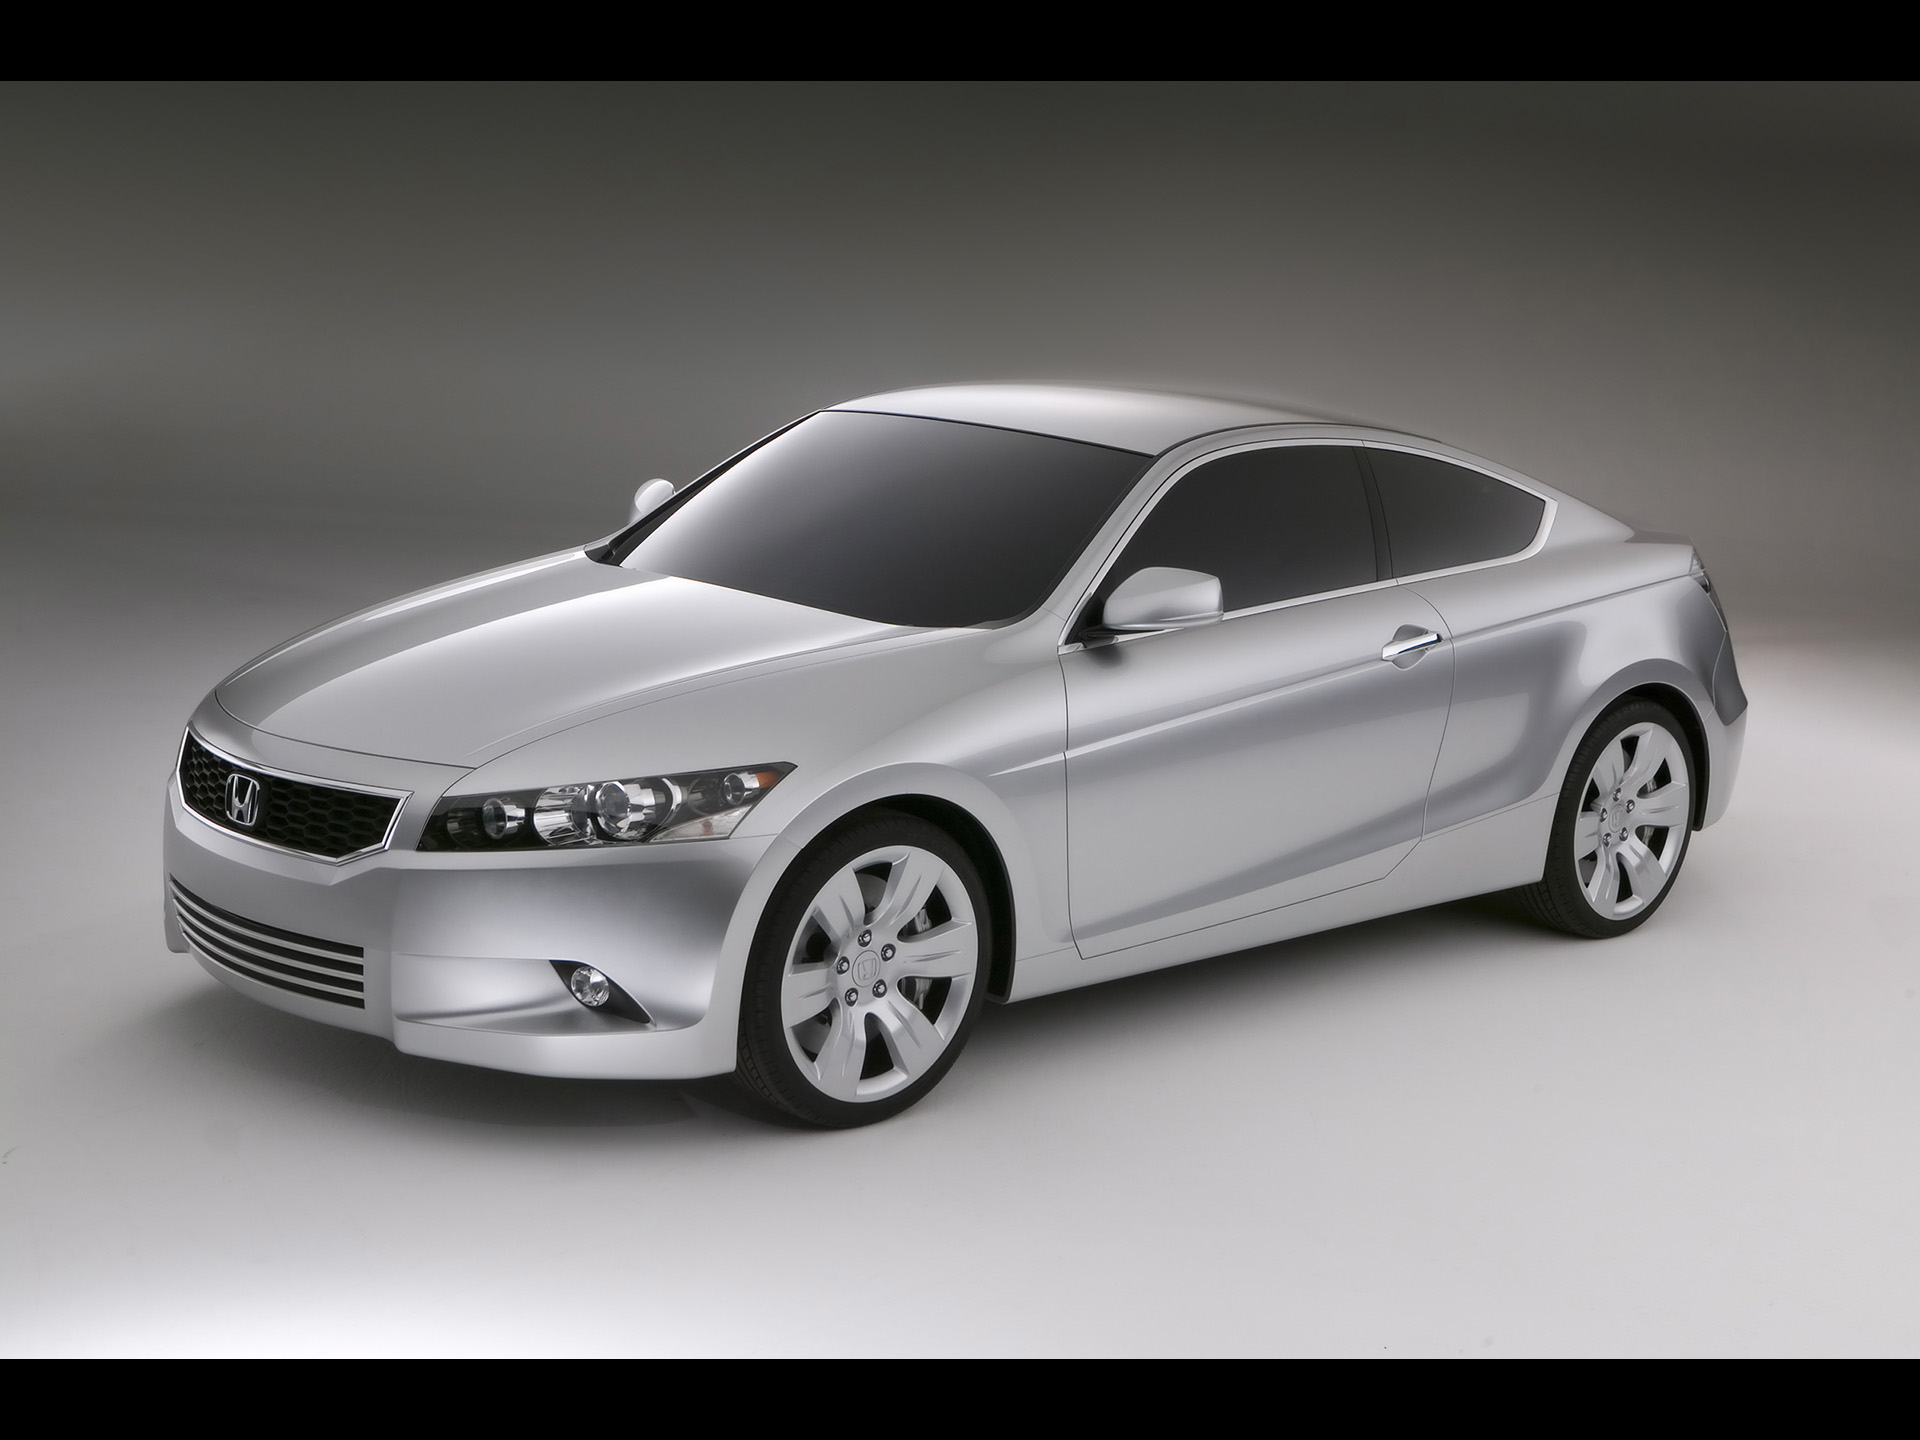 2008 Honda Accord Concept